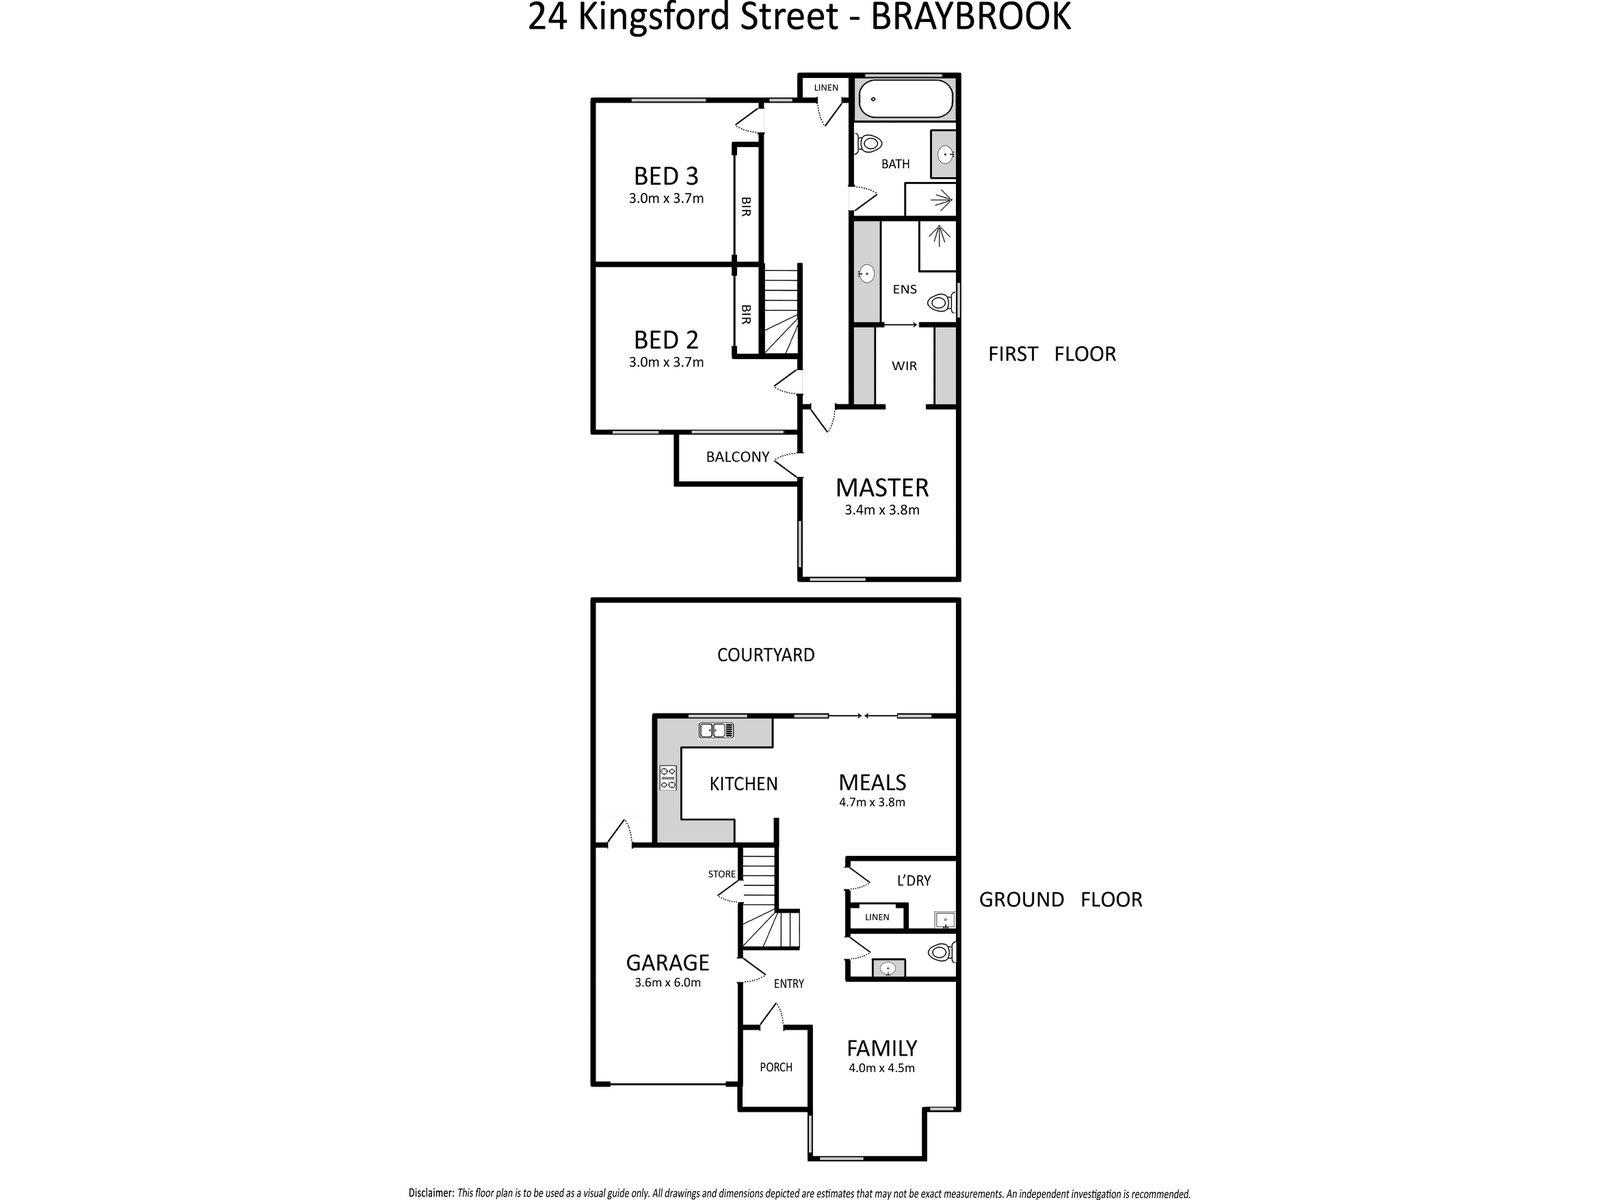 24 Kingsford Street, Braybrook